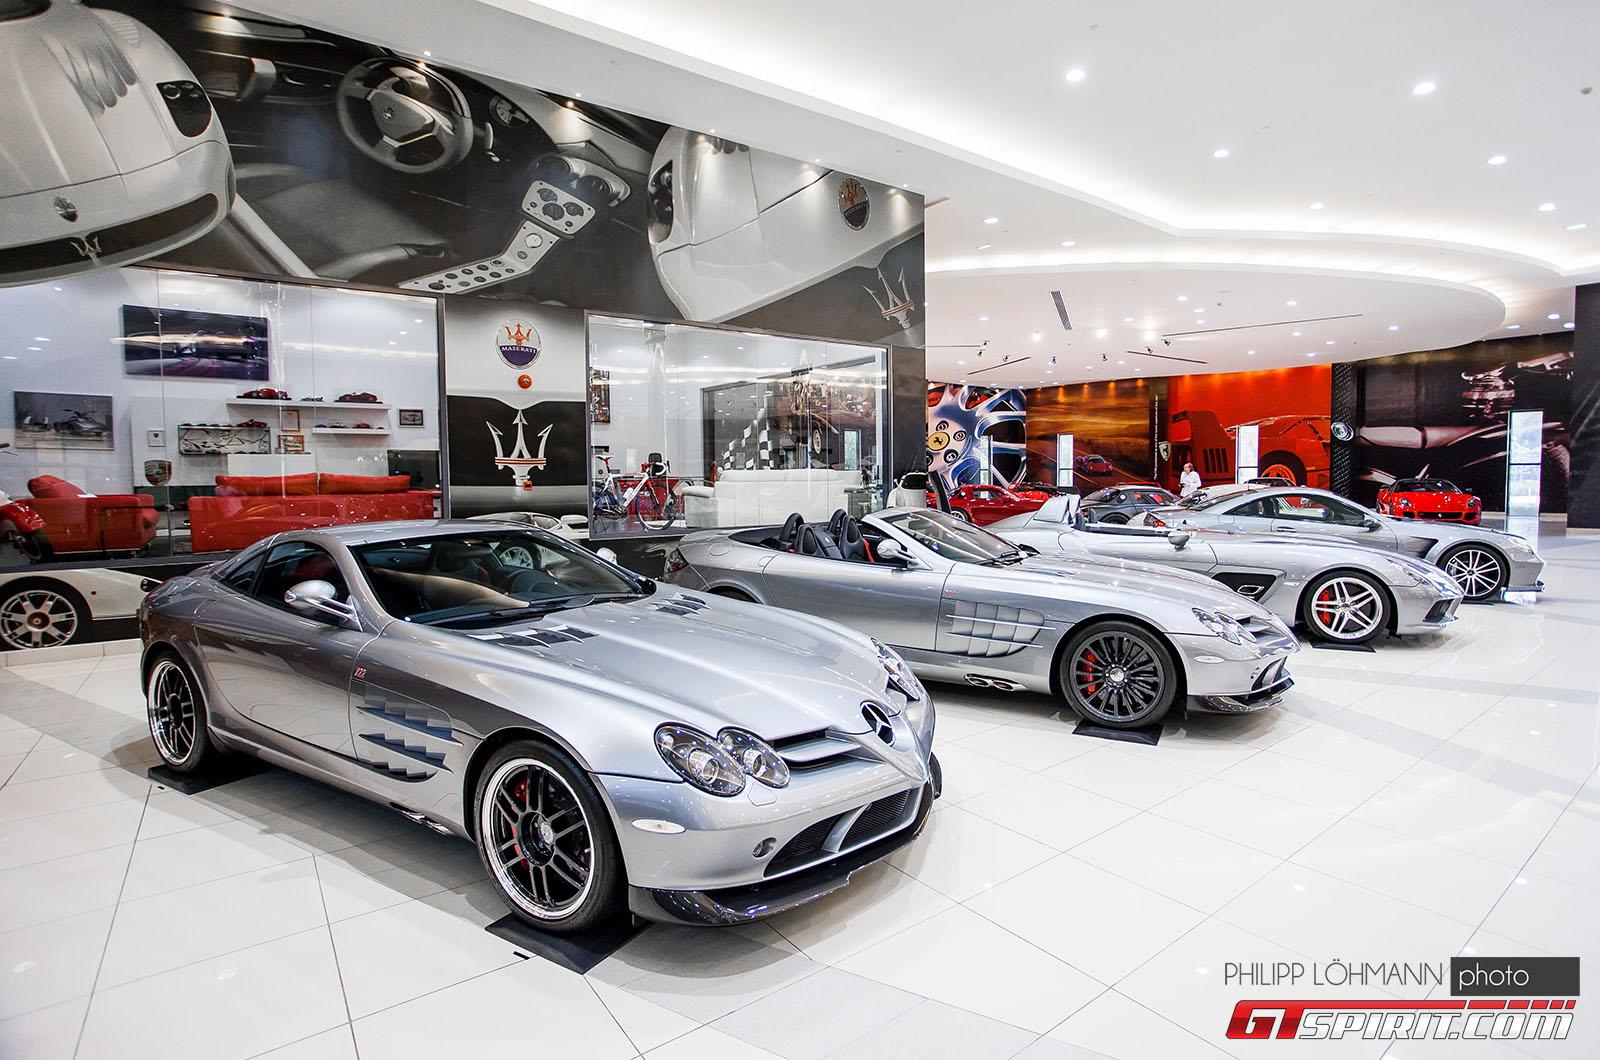 Гараж мечты в Абу-Даби. Mercedes-Benz SLR McLaren 722 Edition